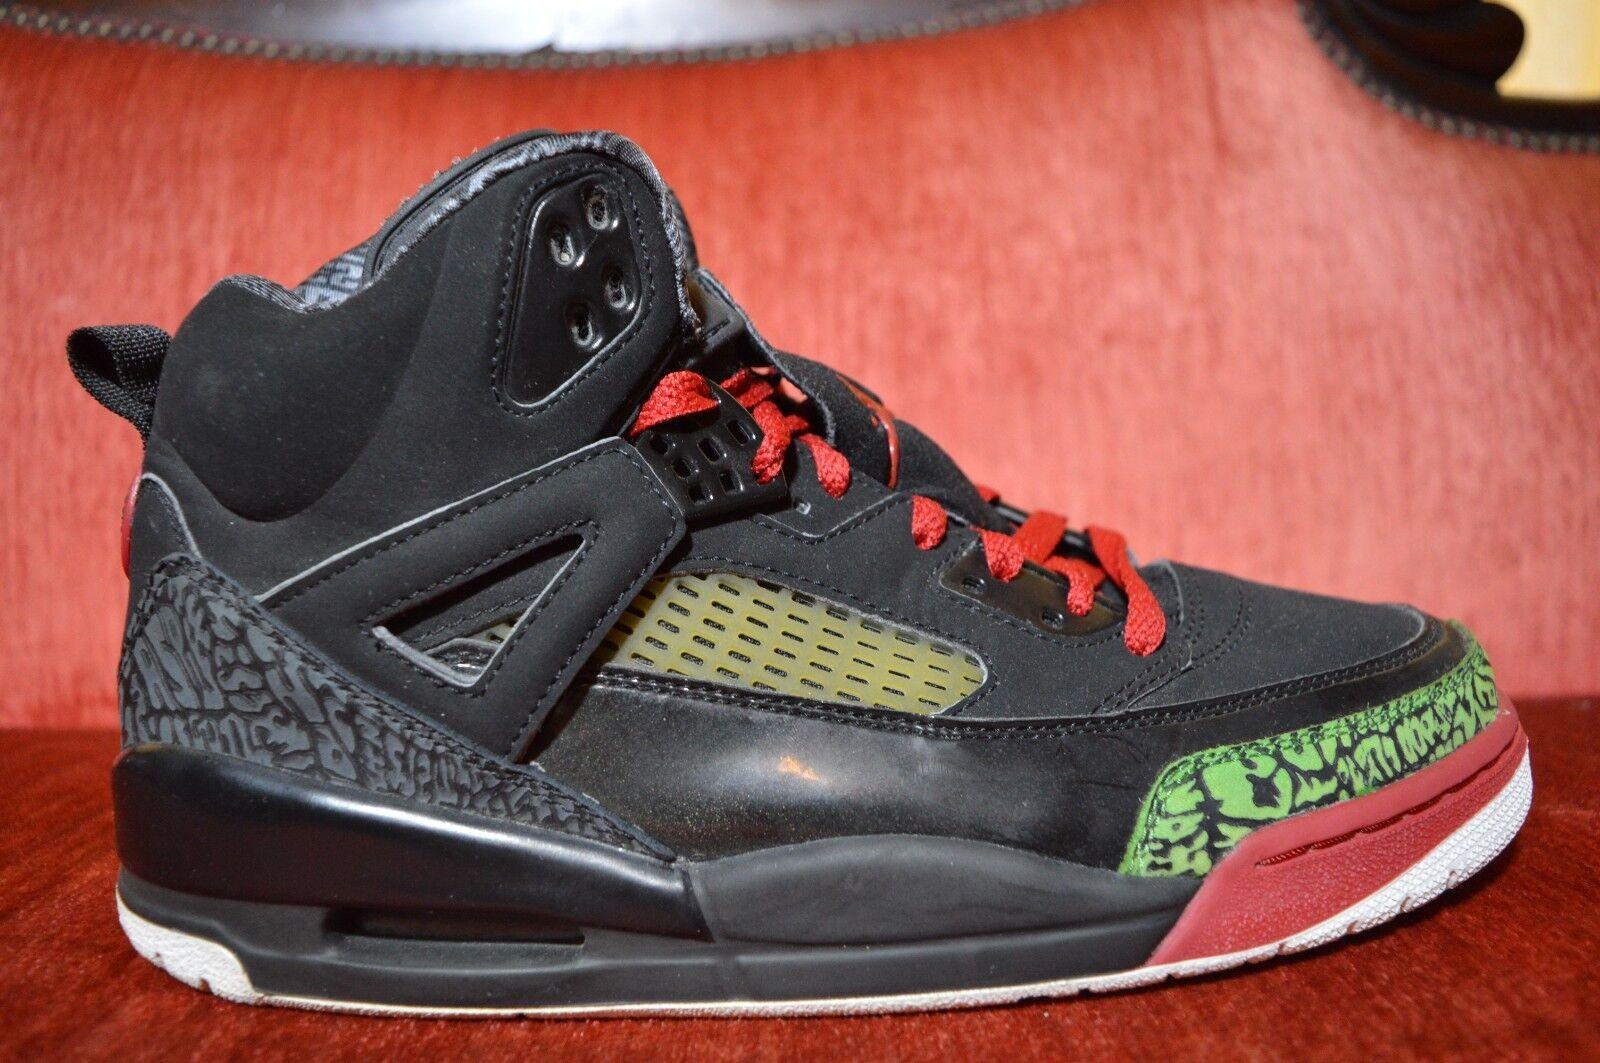 Mens Air Jordan Spizike Black Varsity Red Classic Green 315371-061 Size 9.5